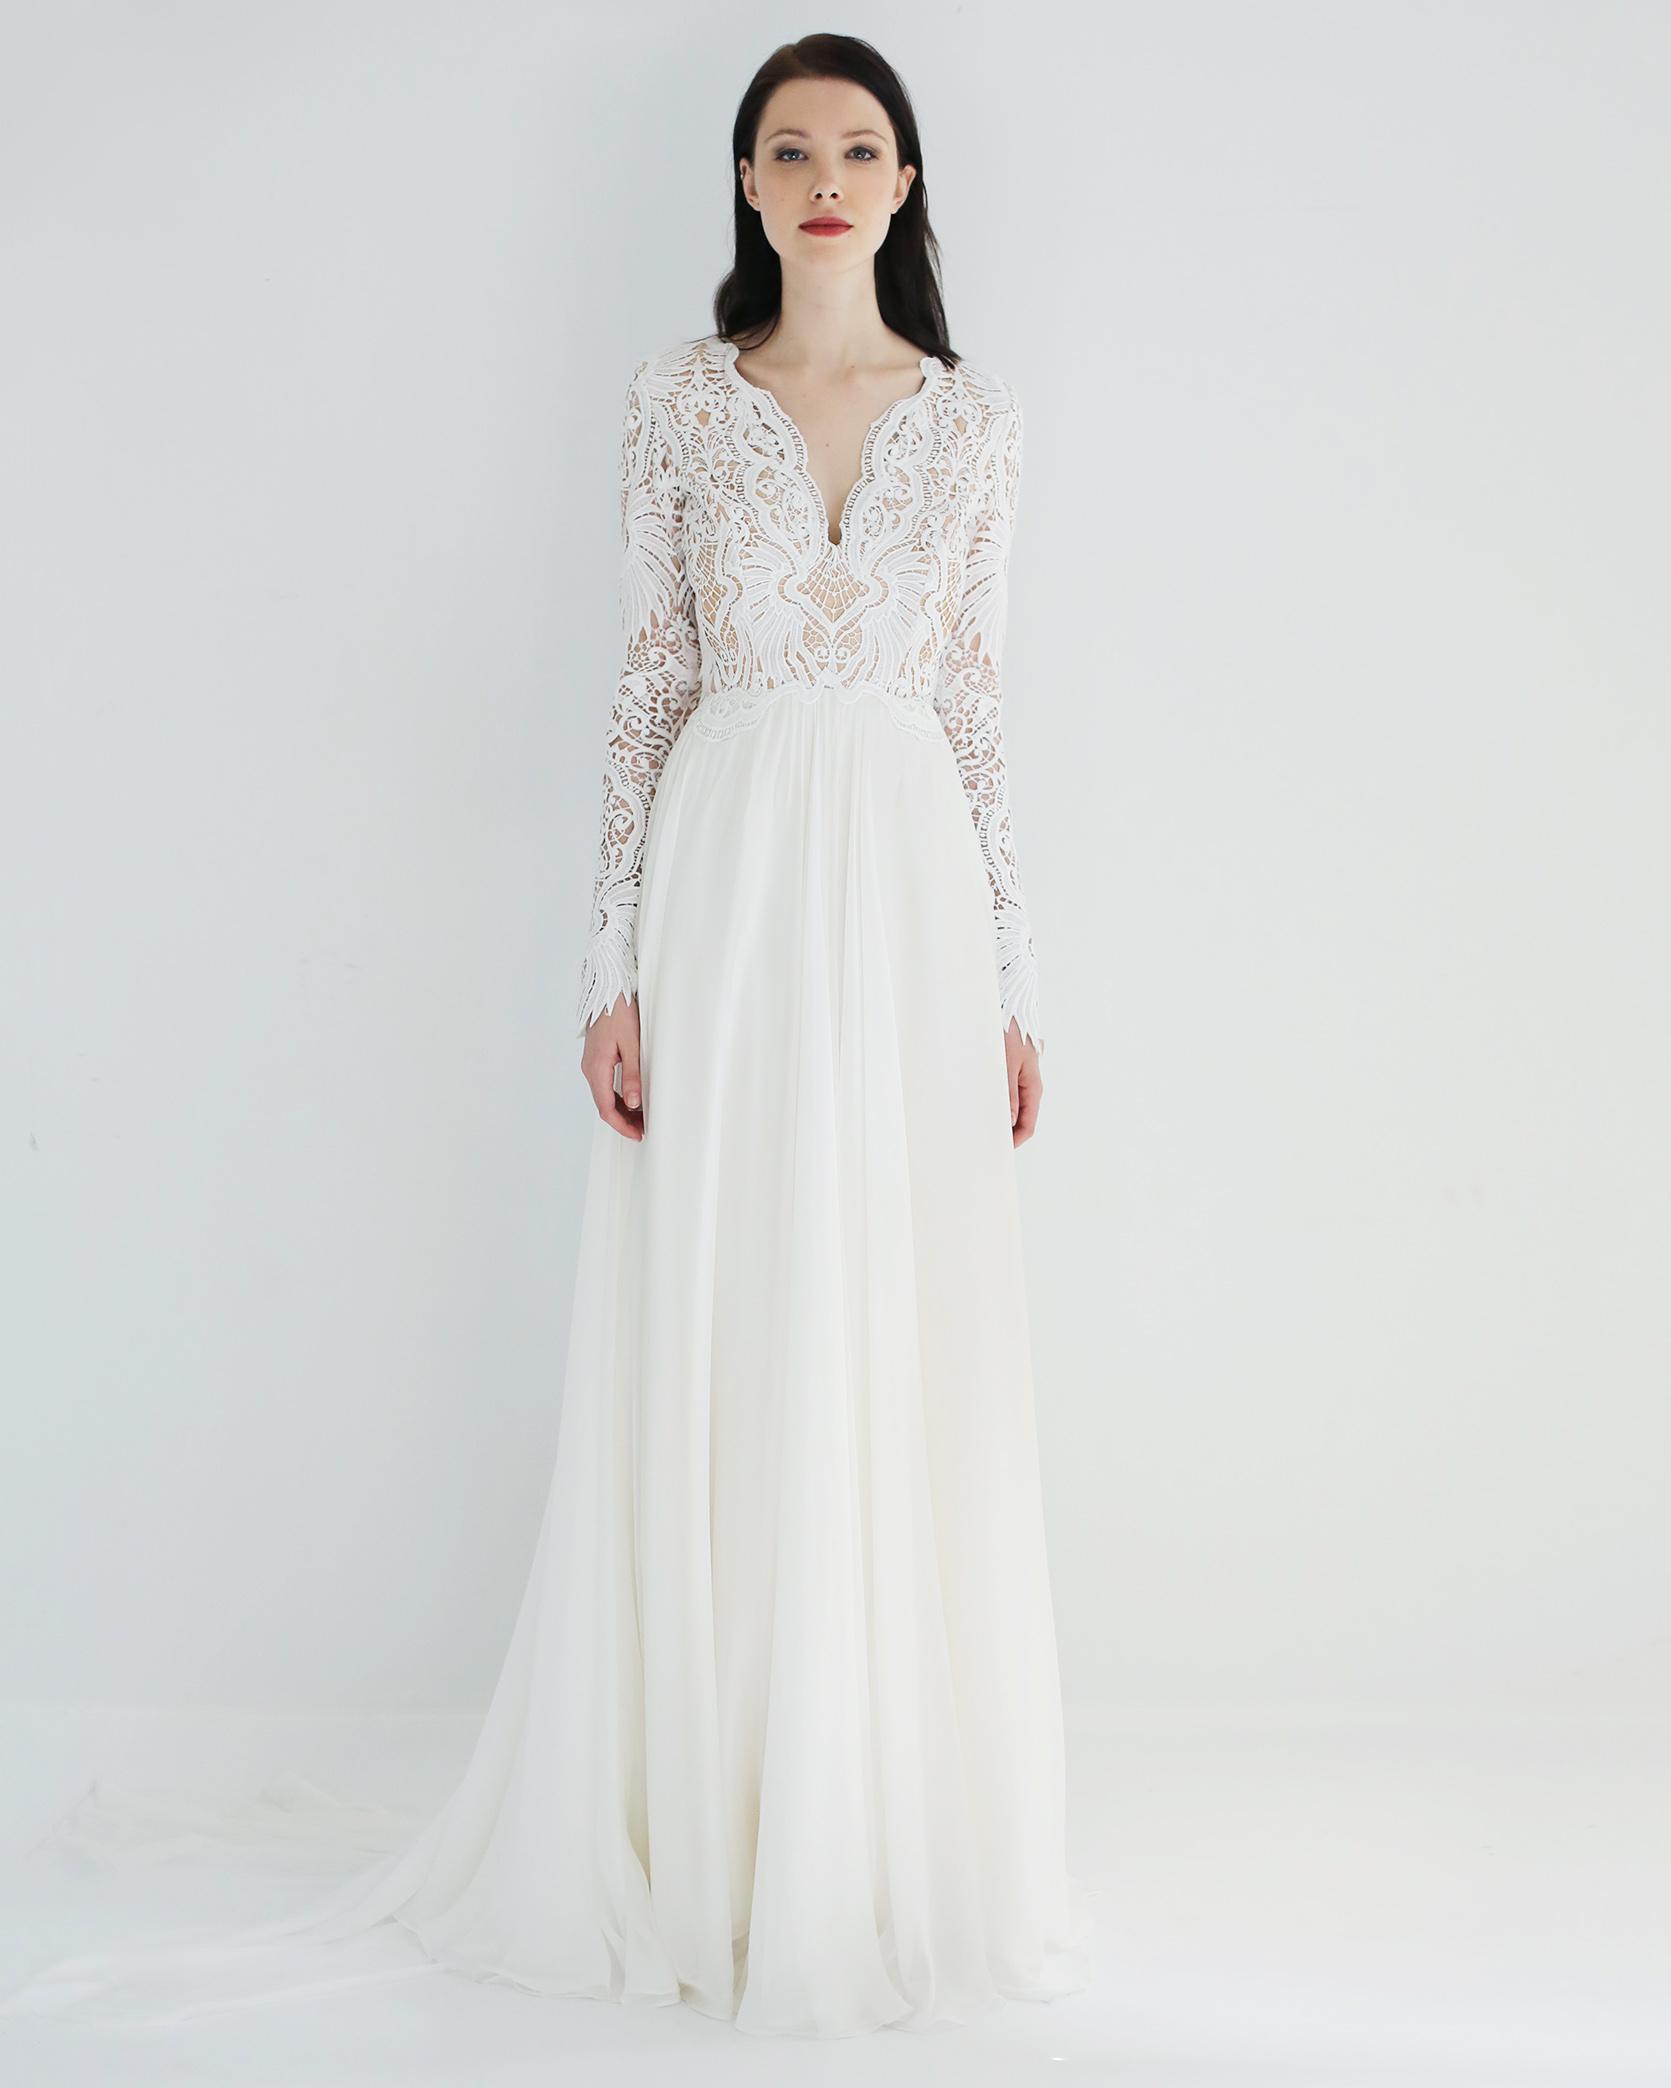 long sleeves a-line leanne marshall wedding dress spring2018